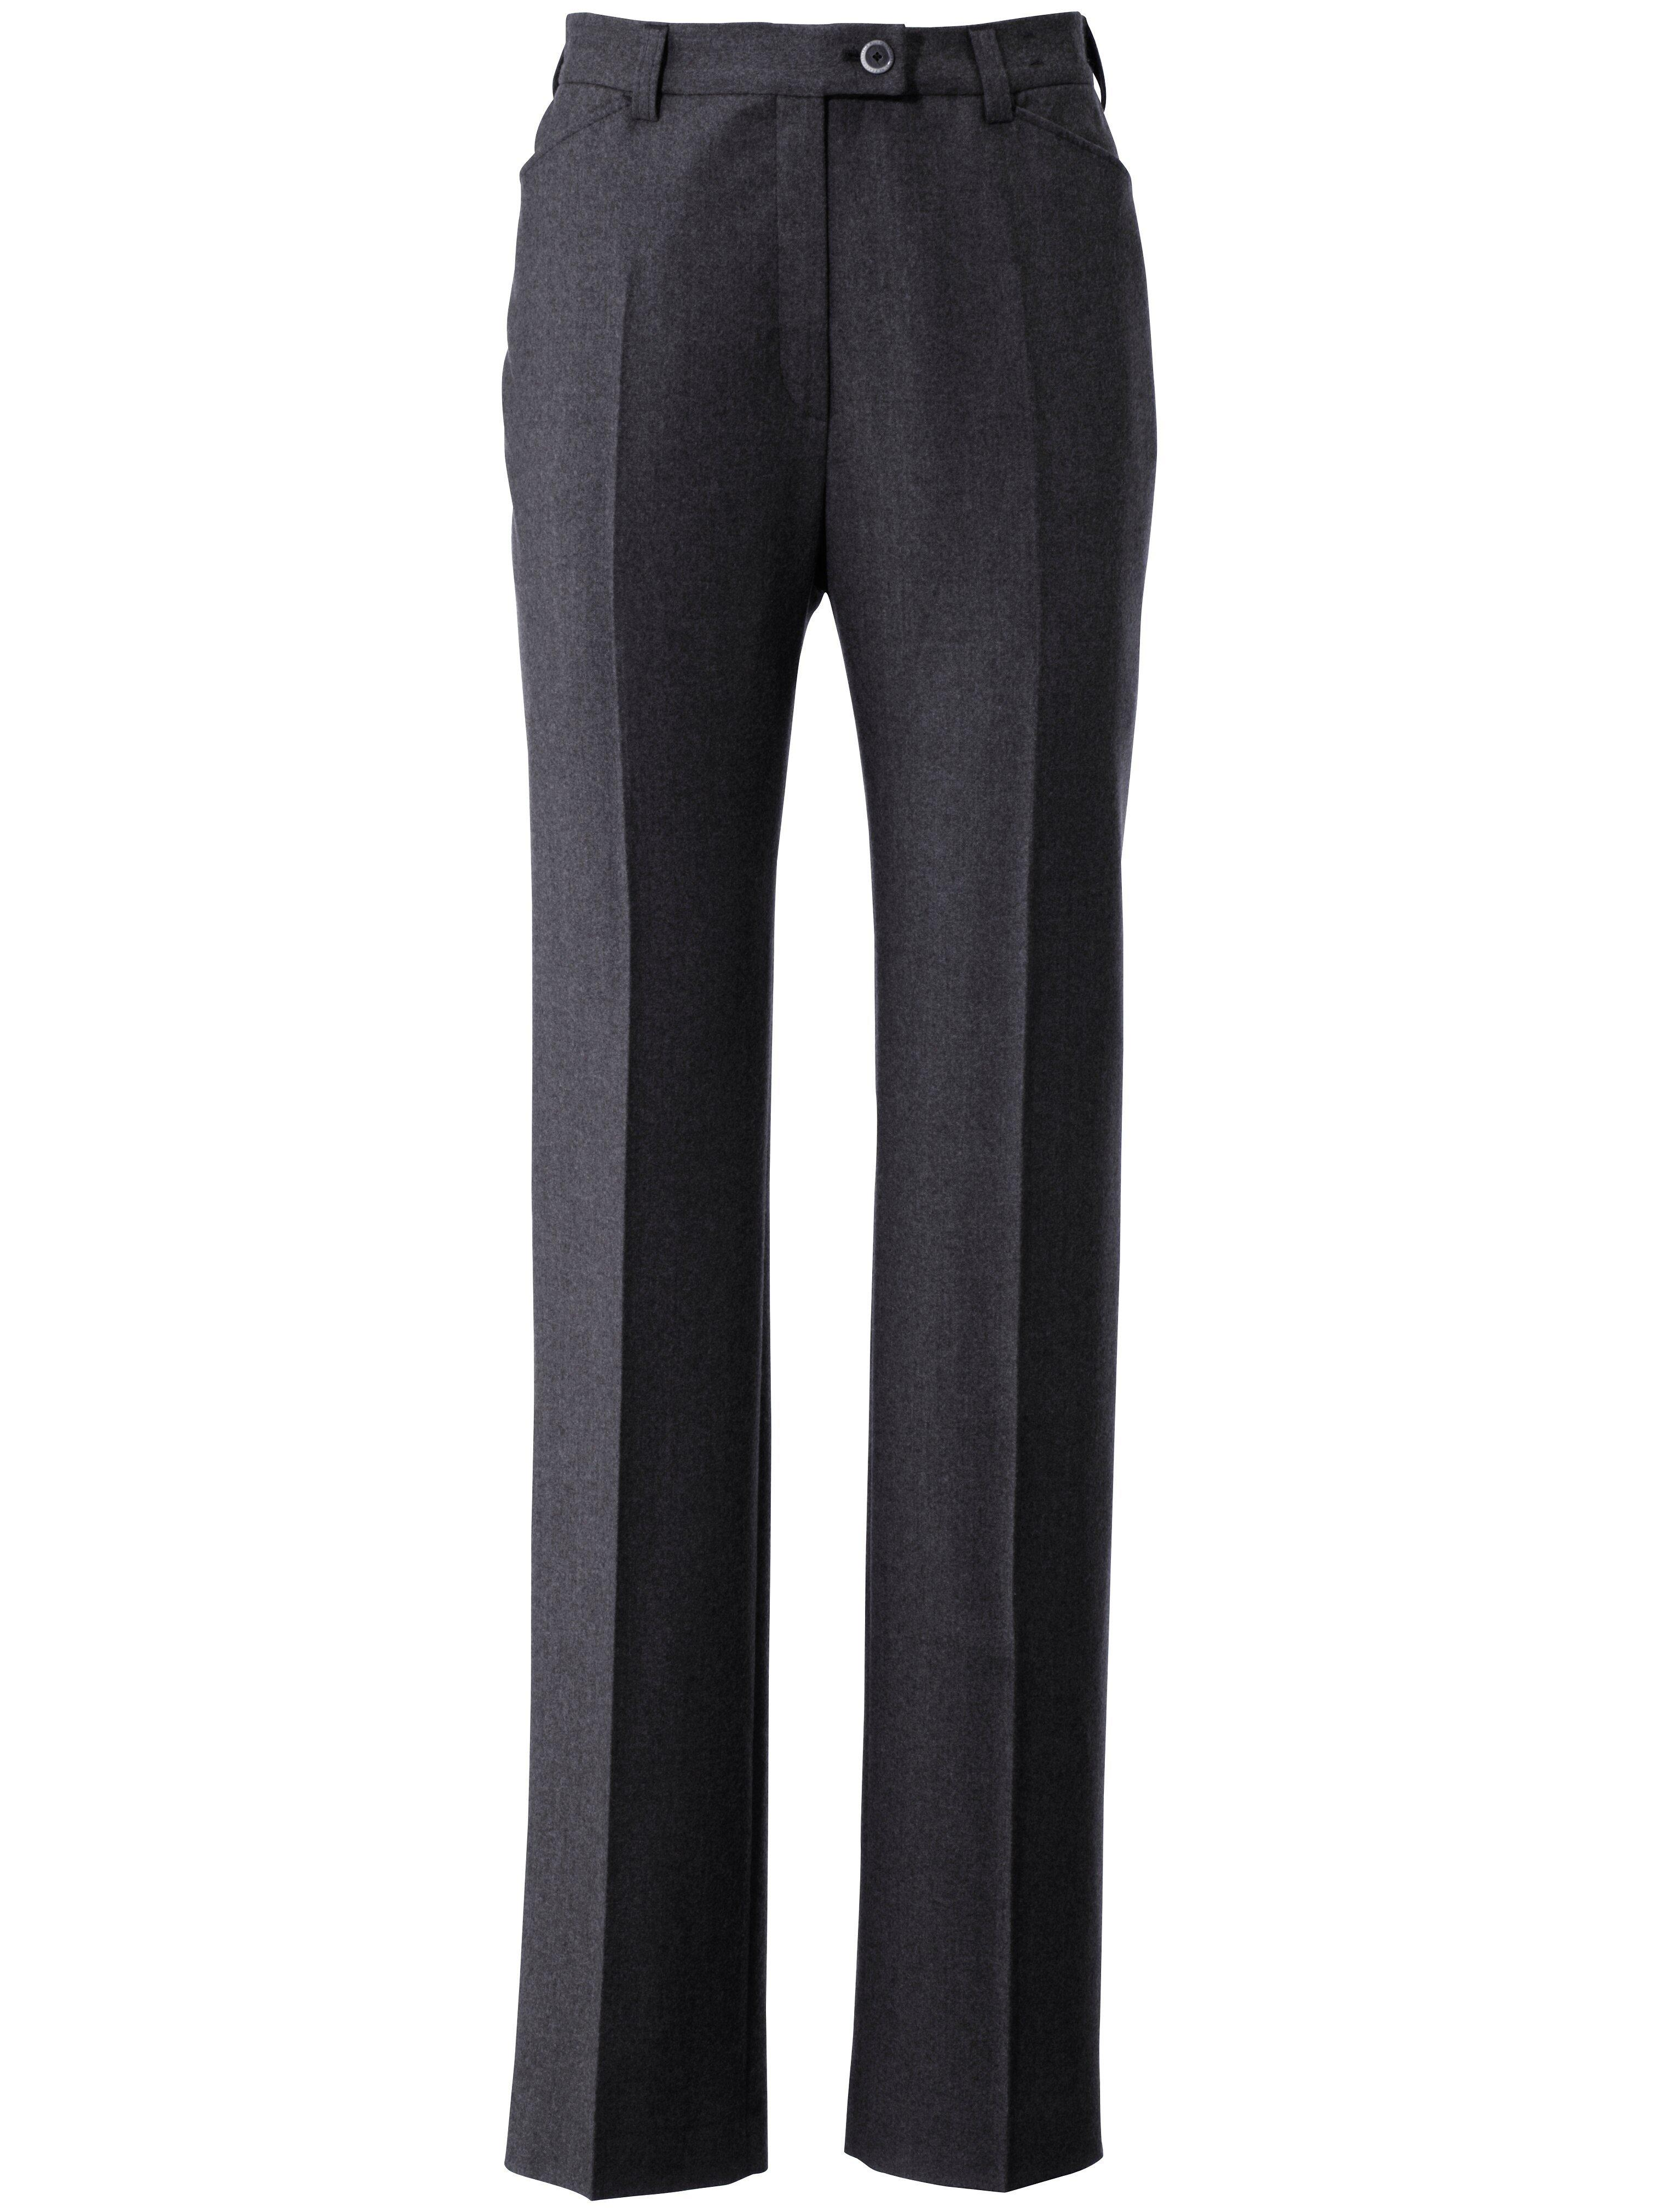 Damen Flanell-Hose Modell NANCY Pro Form Slim Raphaela by Brax grau | Plus Size | 04044818151451